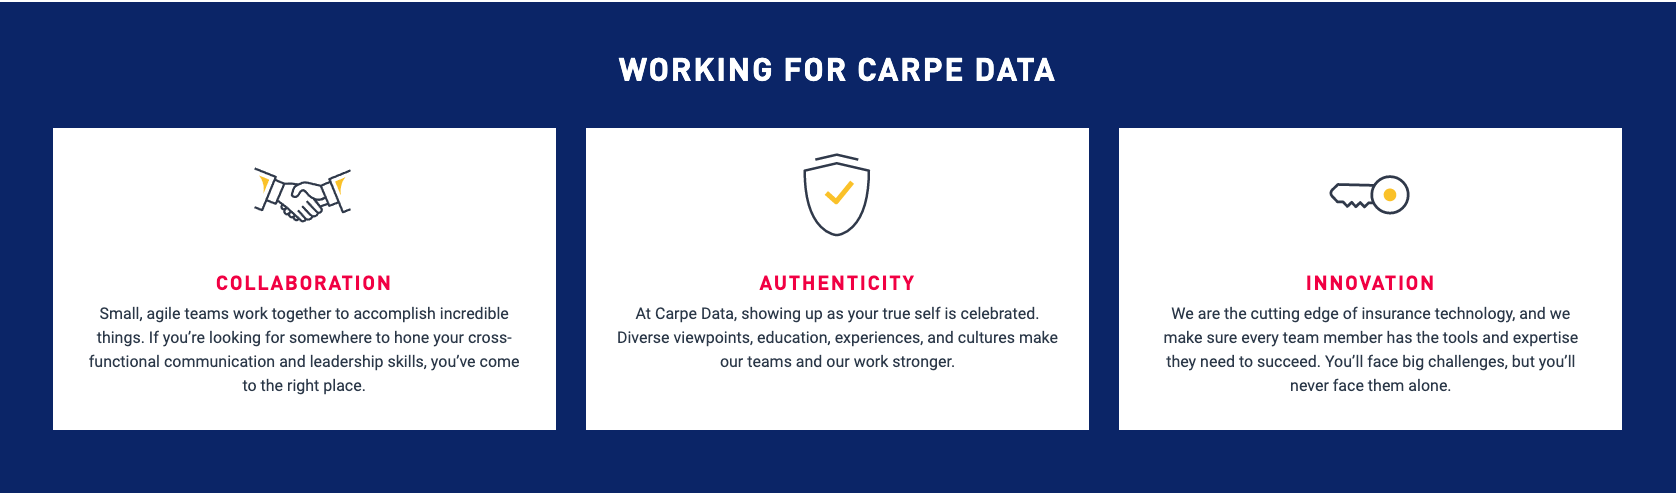 carpe data company perks